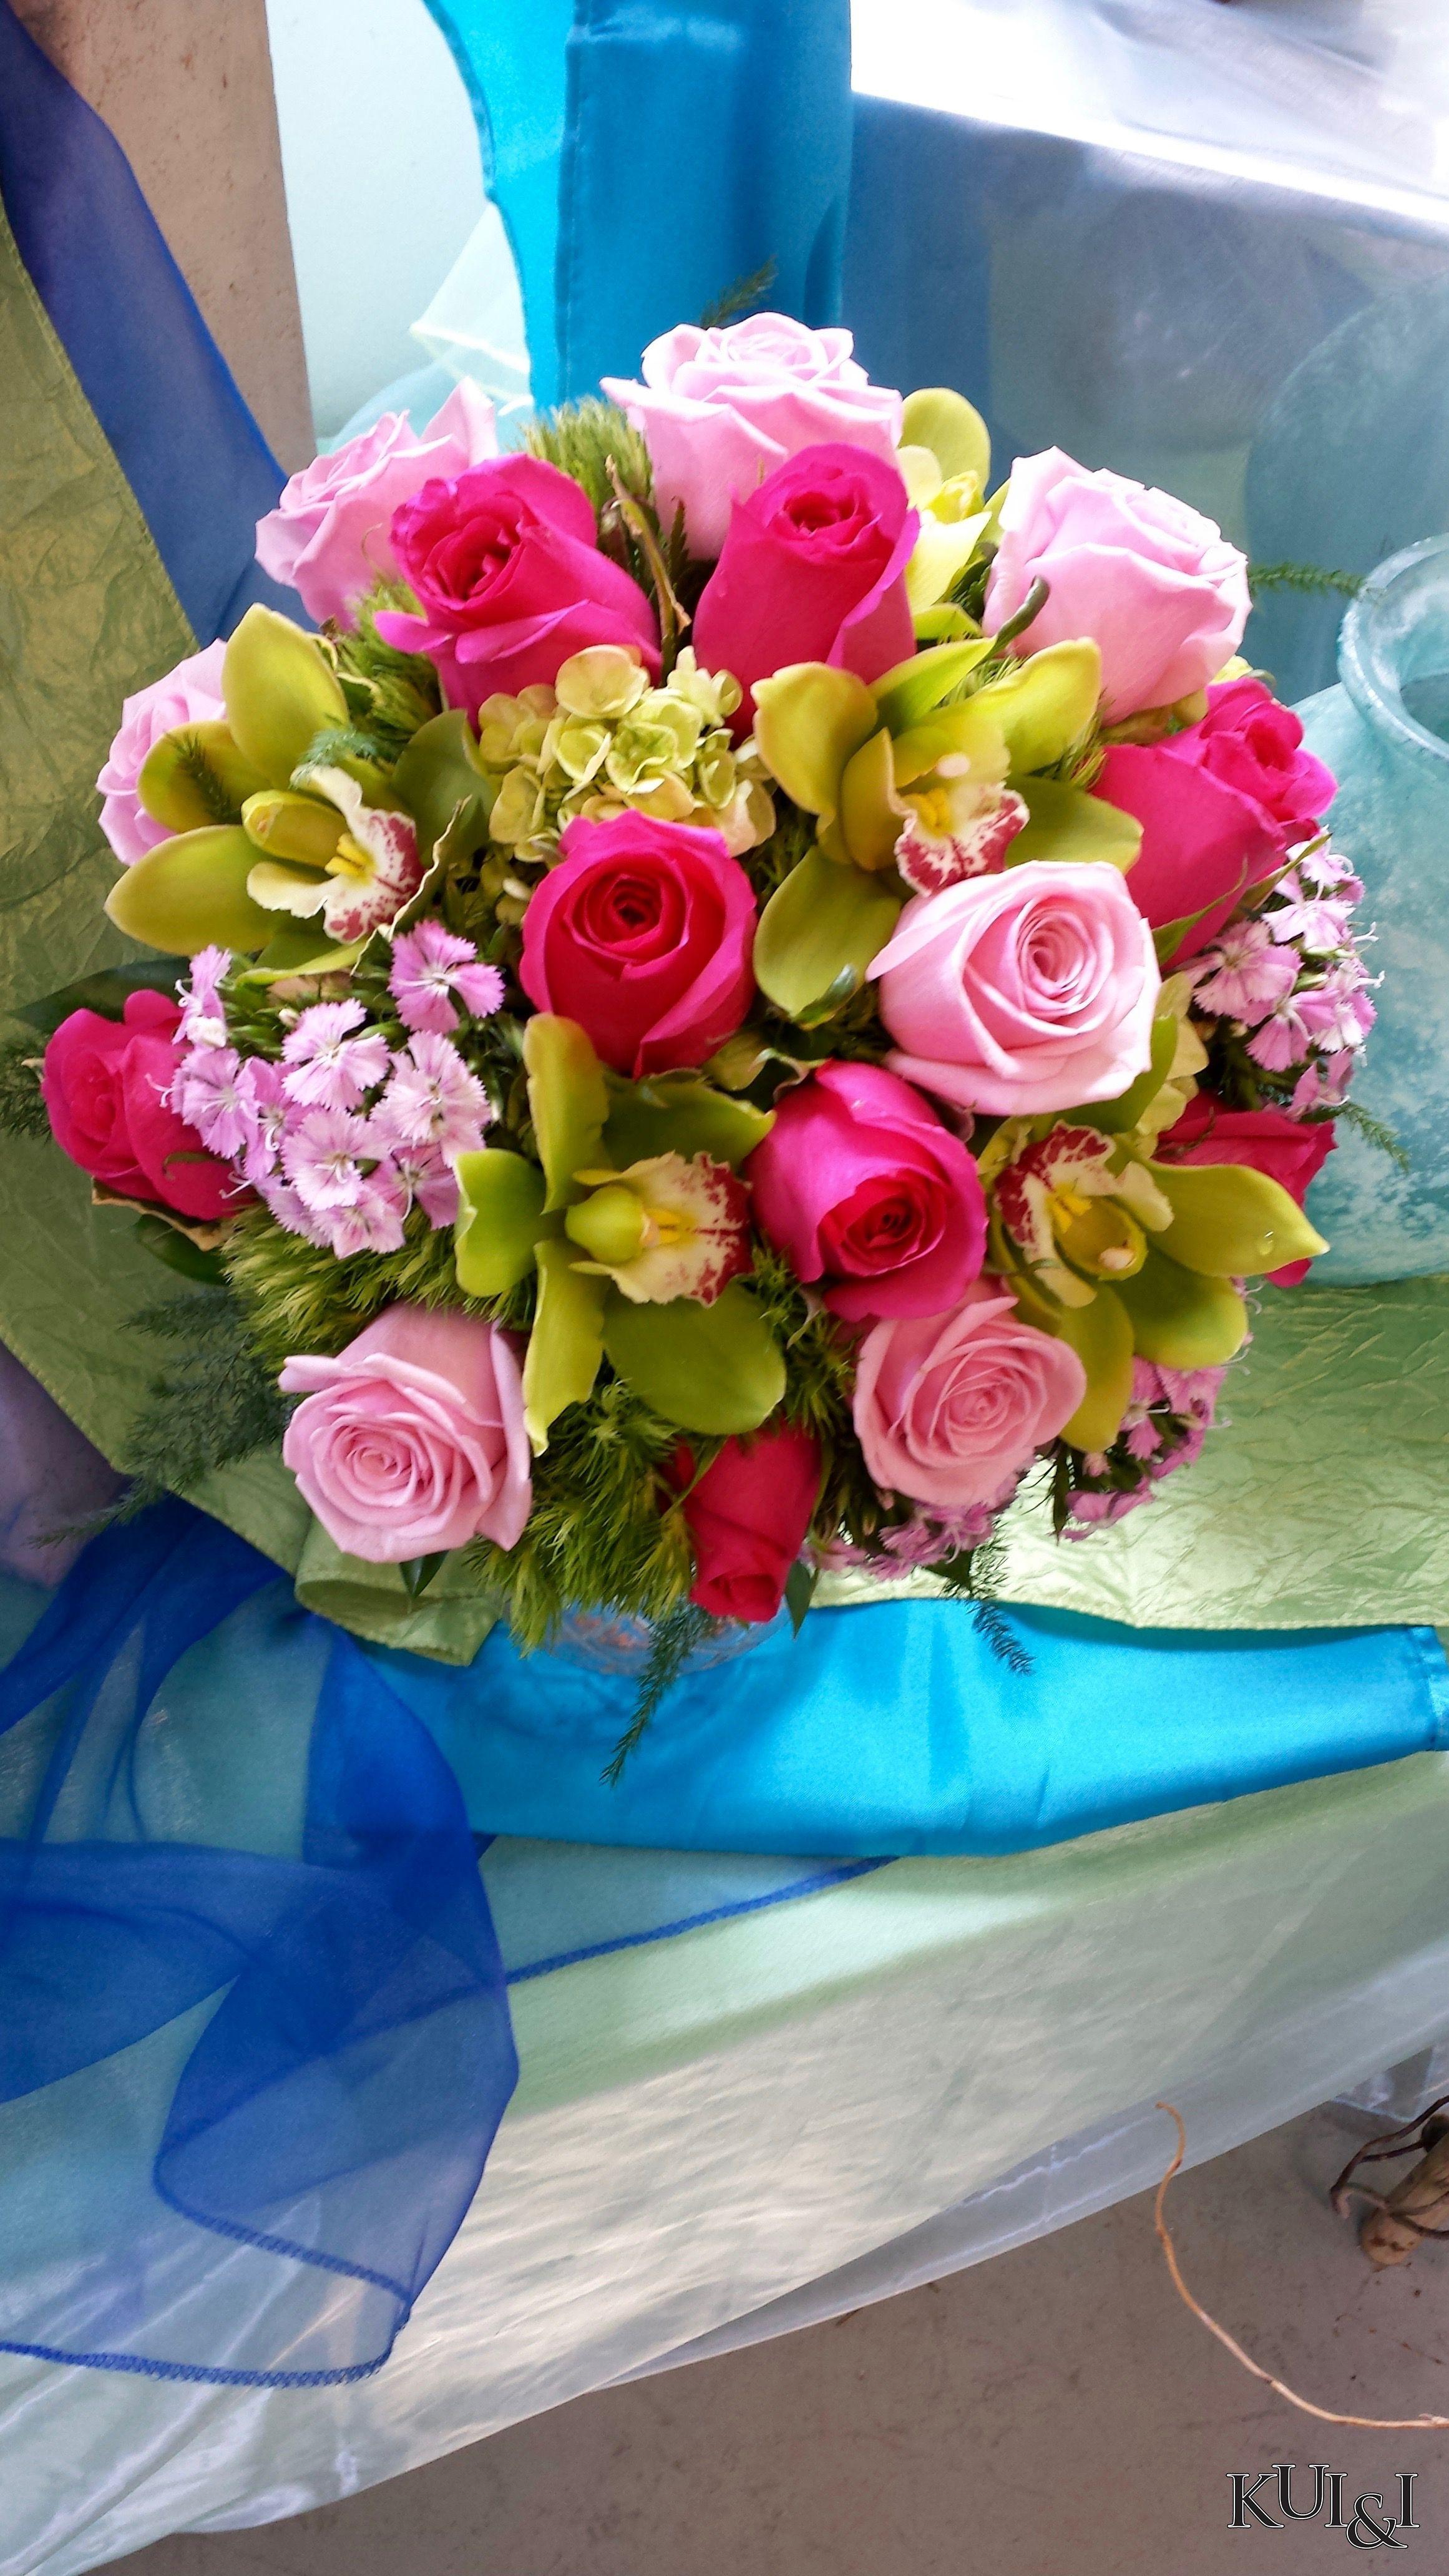 Colorful Wedding Bouquet Kui I Florist Llc Hilo Hawaii